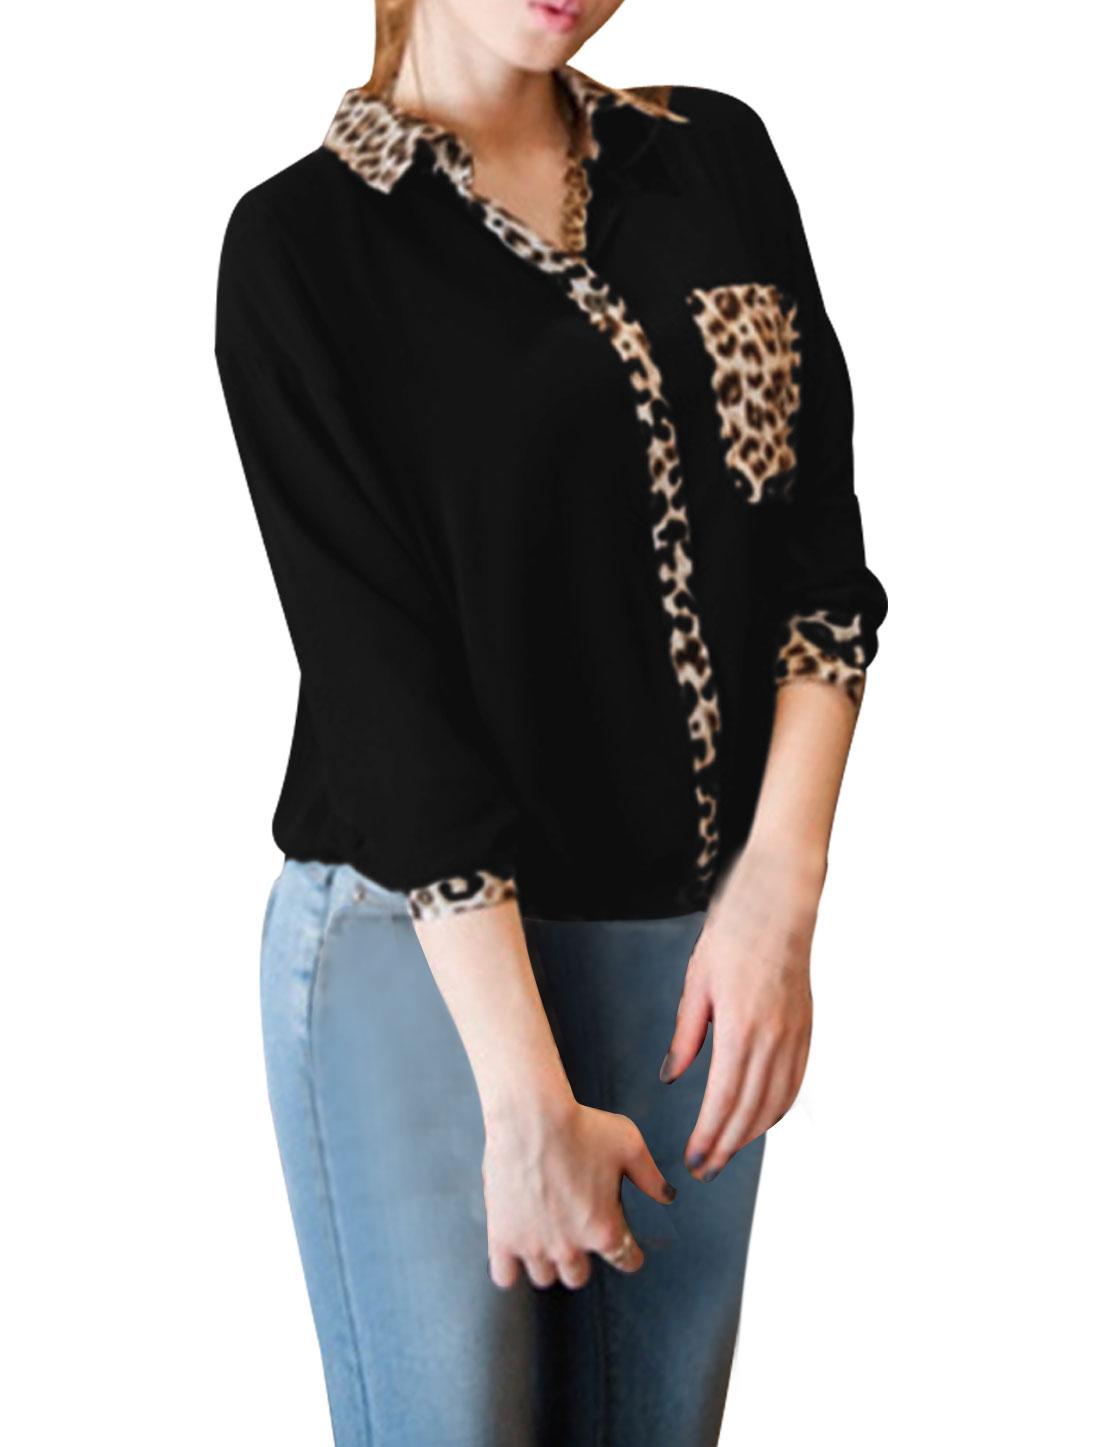 Ladies Black Long Sleeves Leopard Prints Autumn Casual Blouse XS